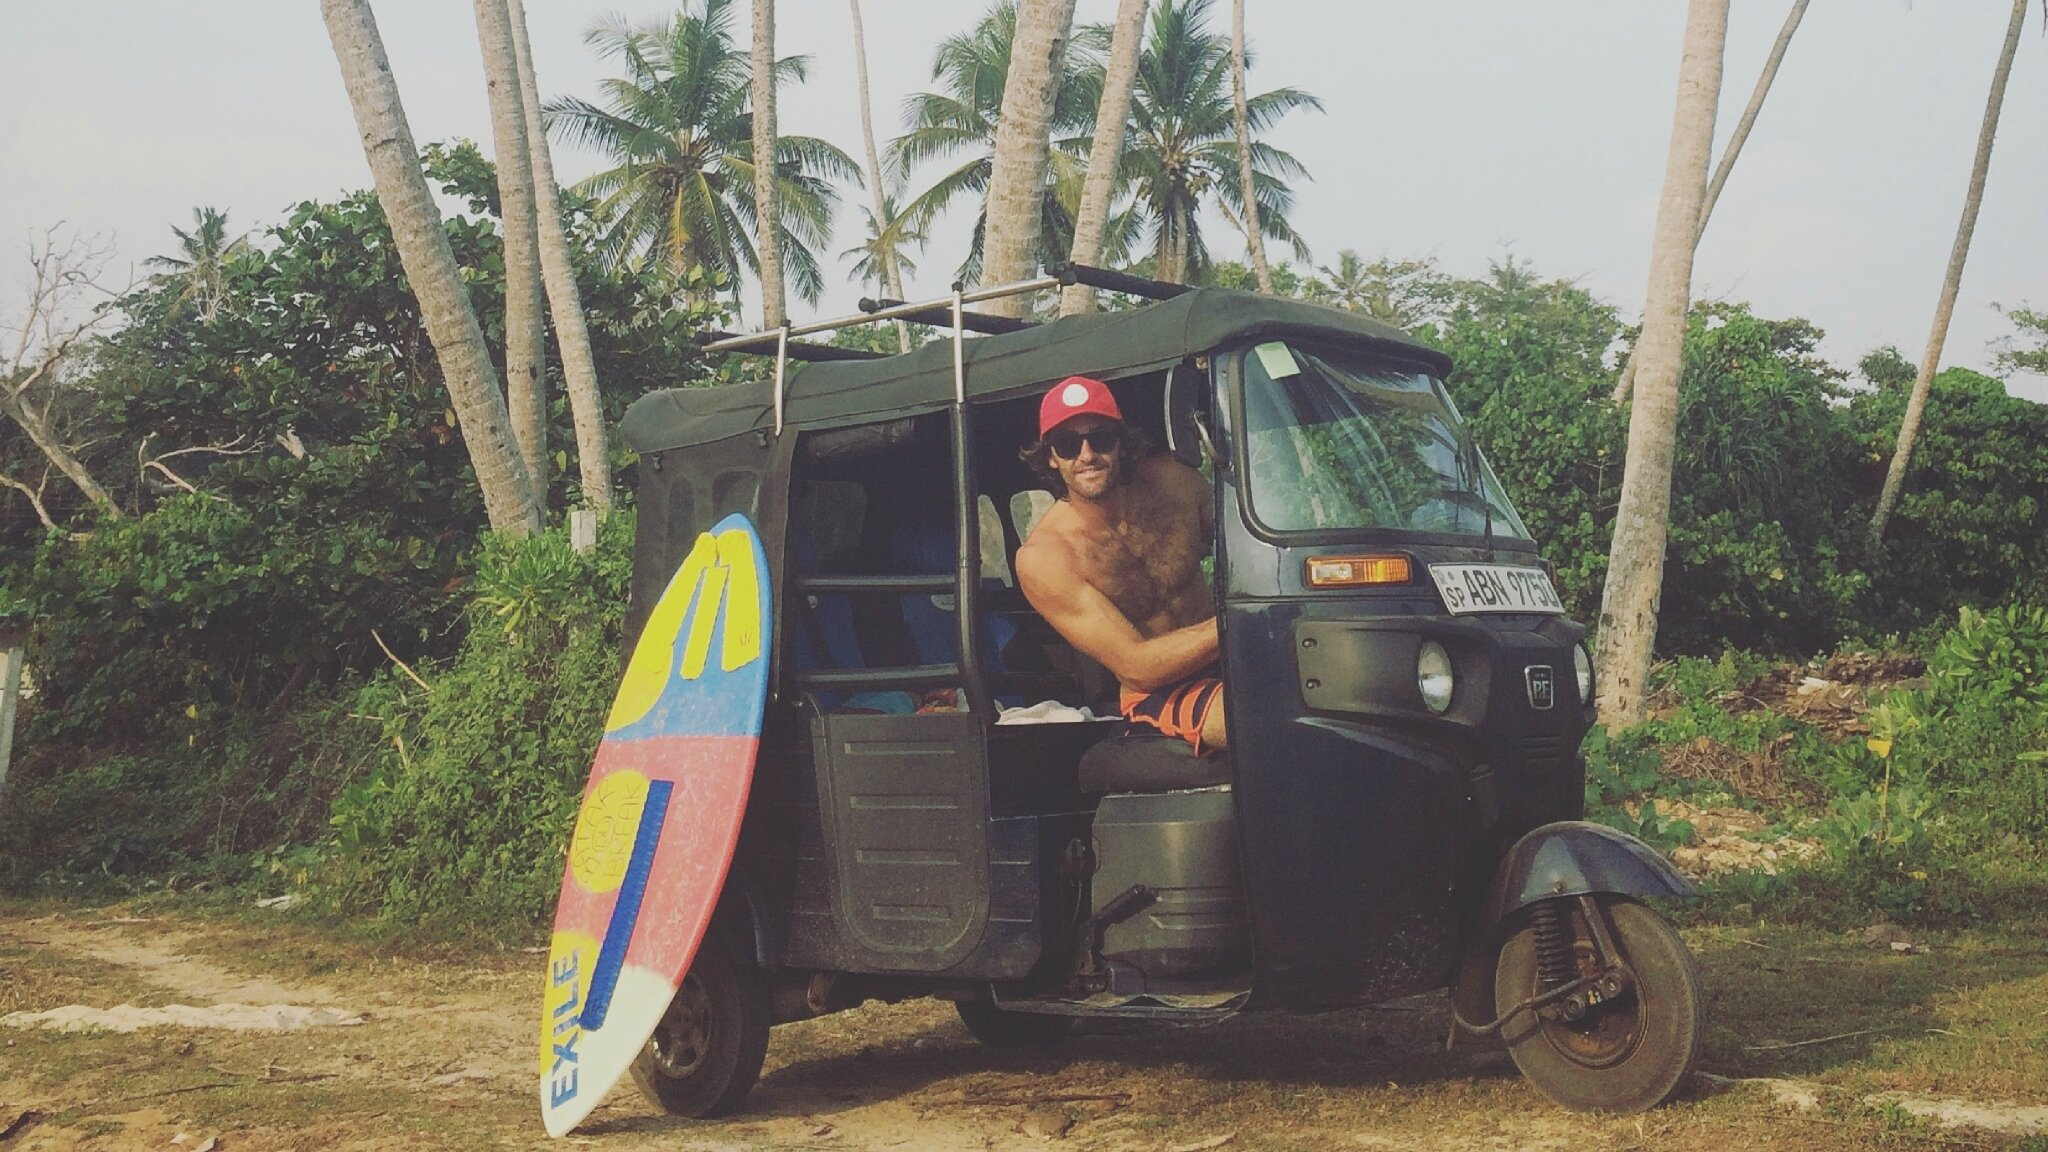 Sri Lanka adventures coming soon...